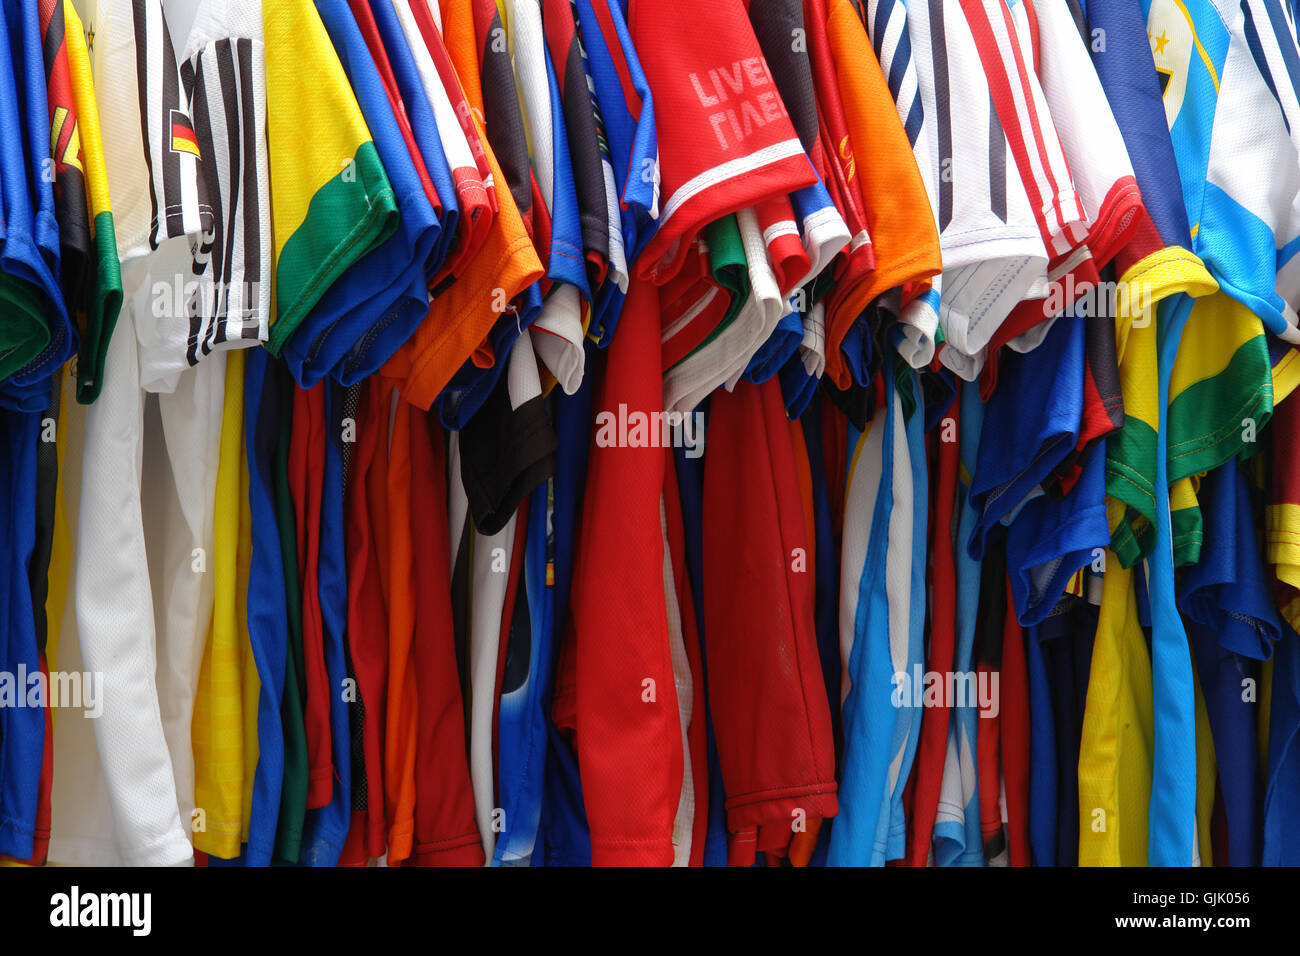 soccer jerseys - Stock Image